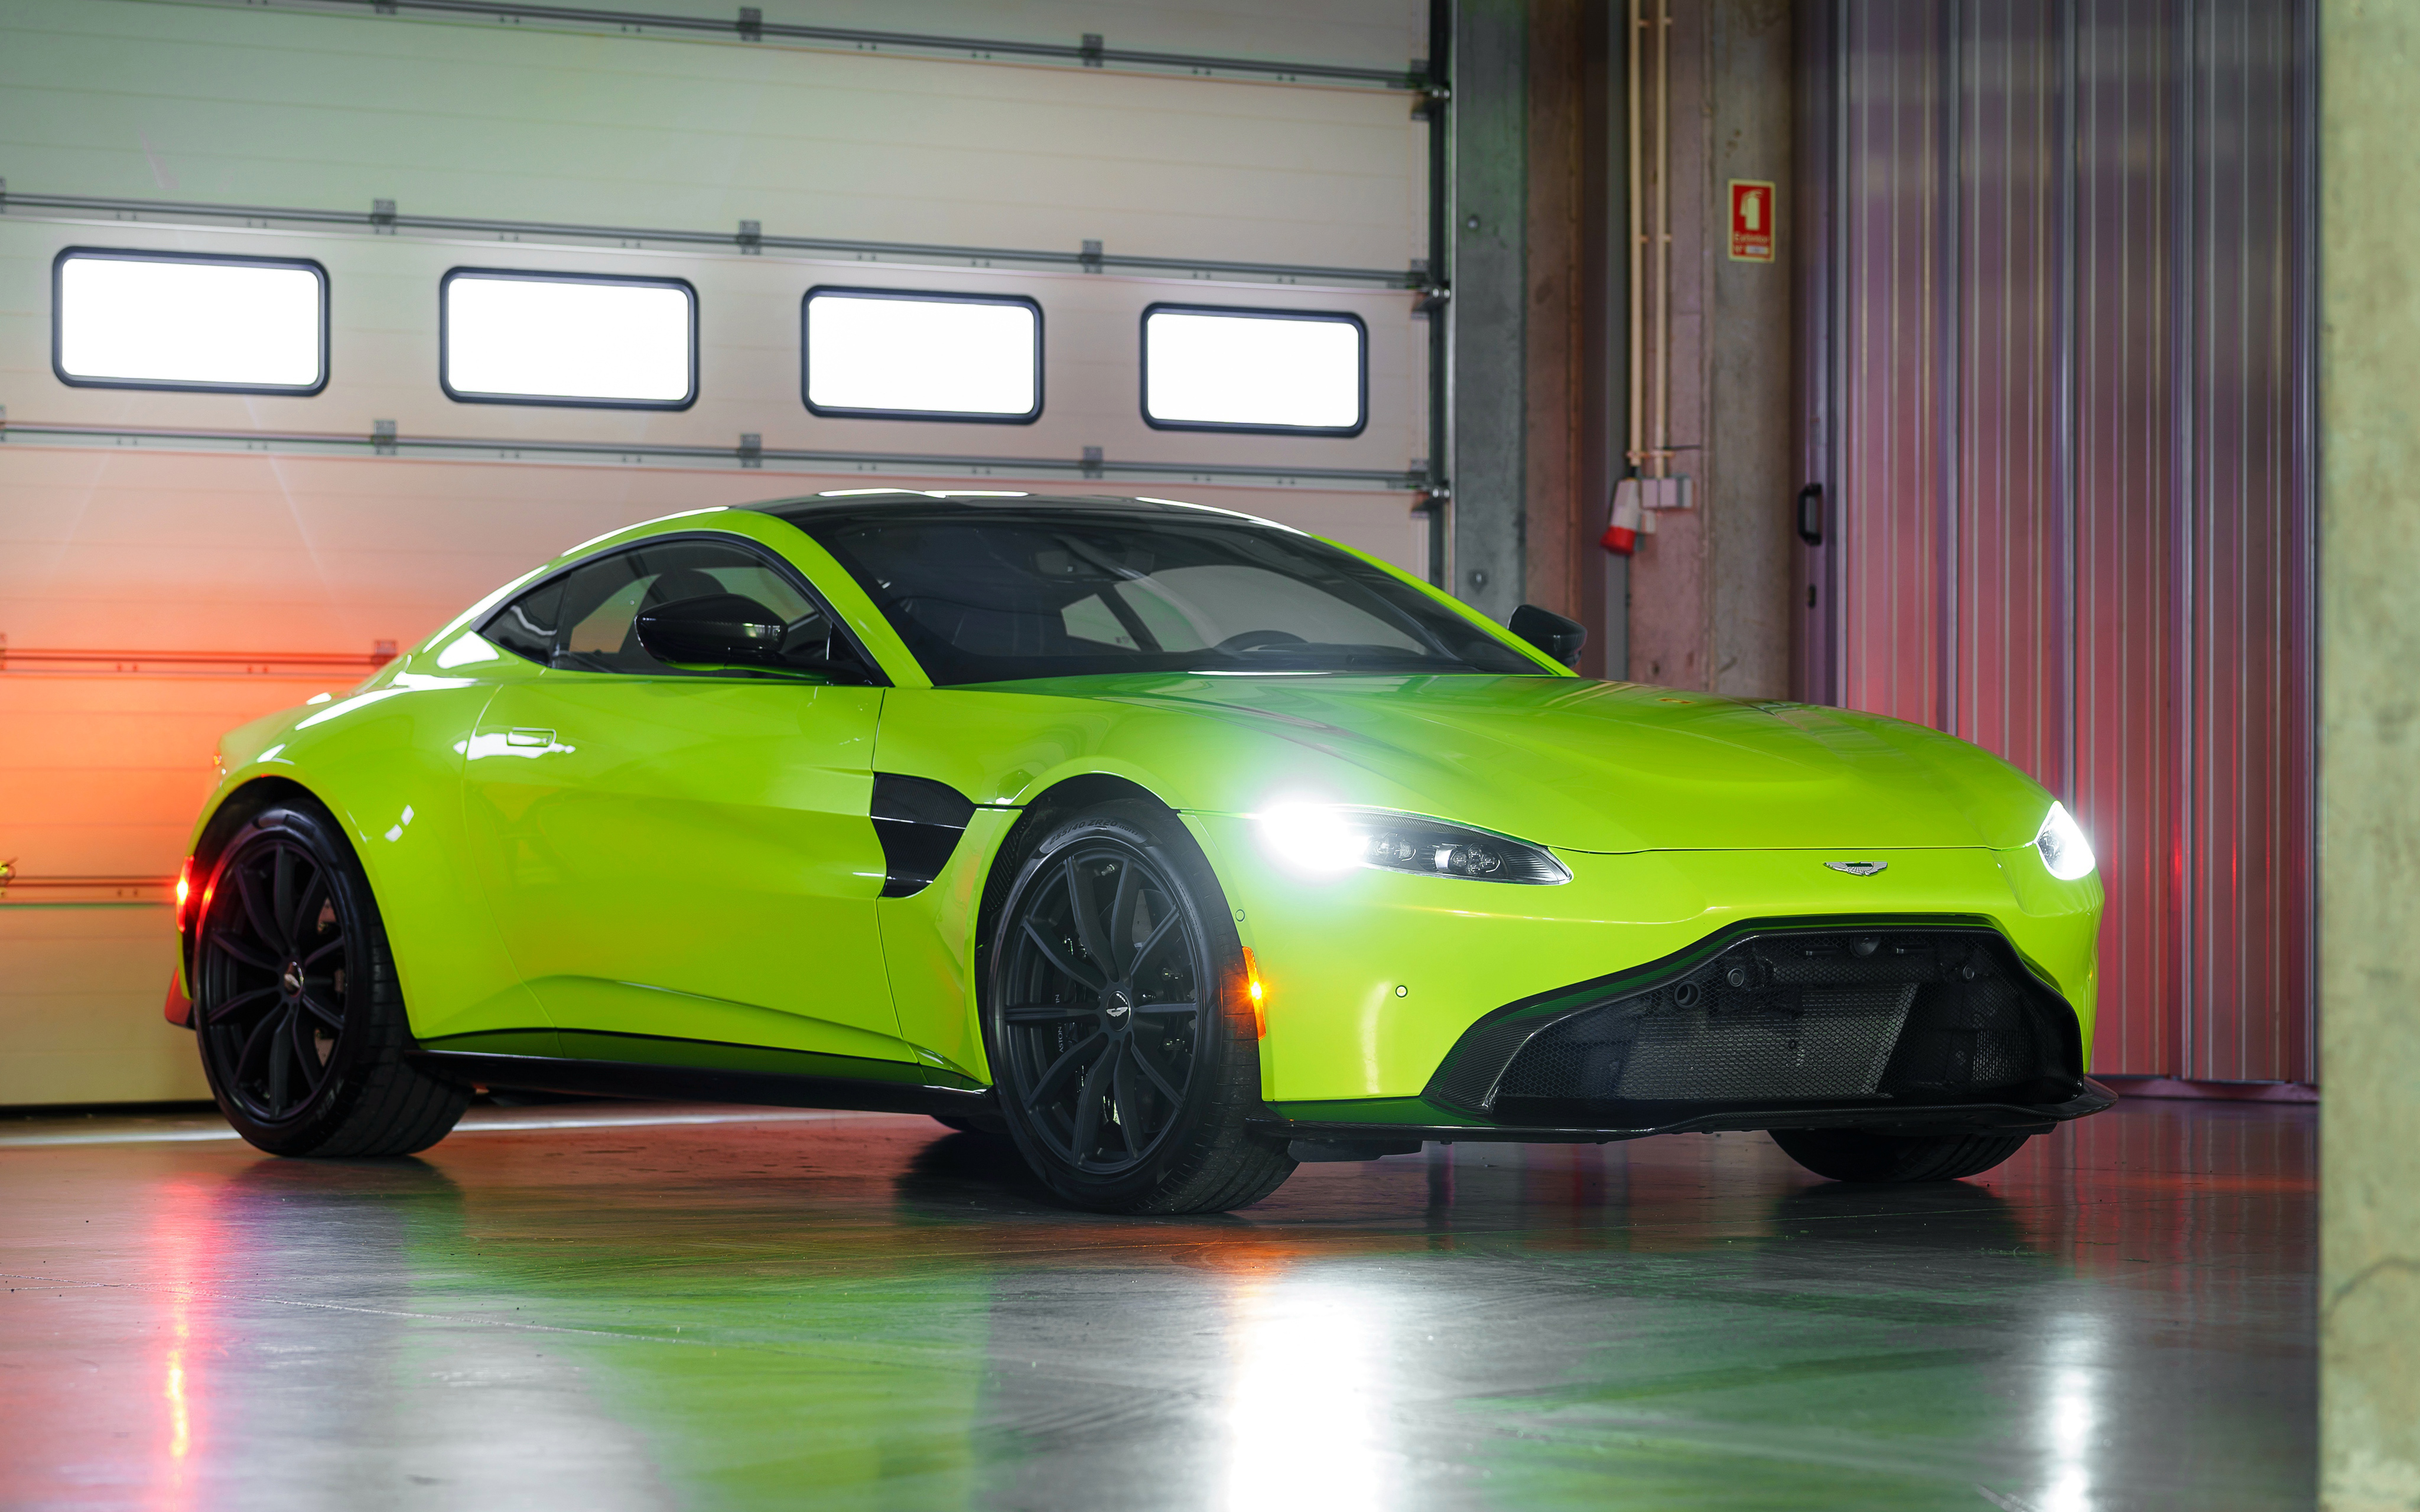 2019 Aston Martin Vantage Lime Essence Green 4k 4k Ultra Hd